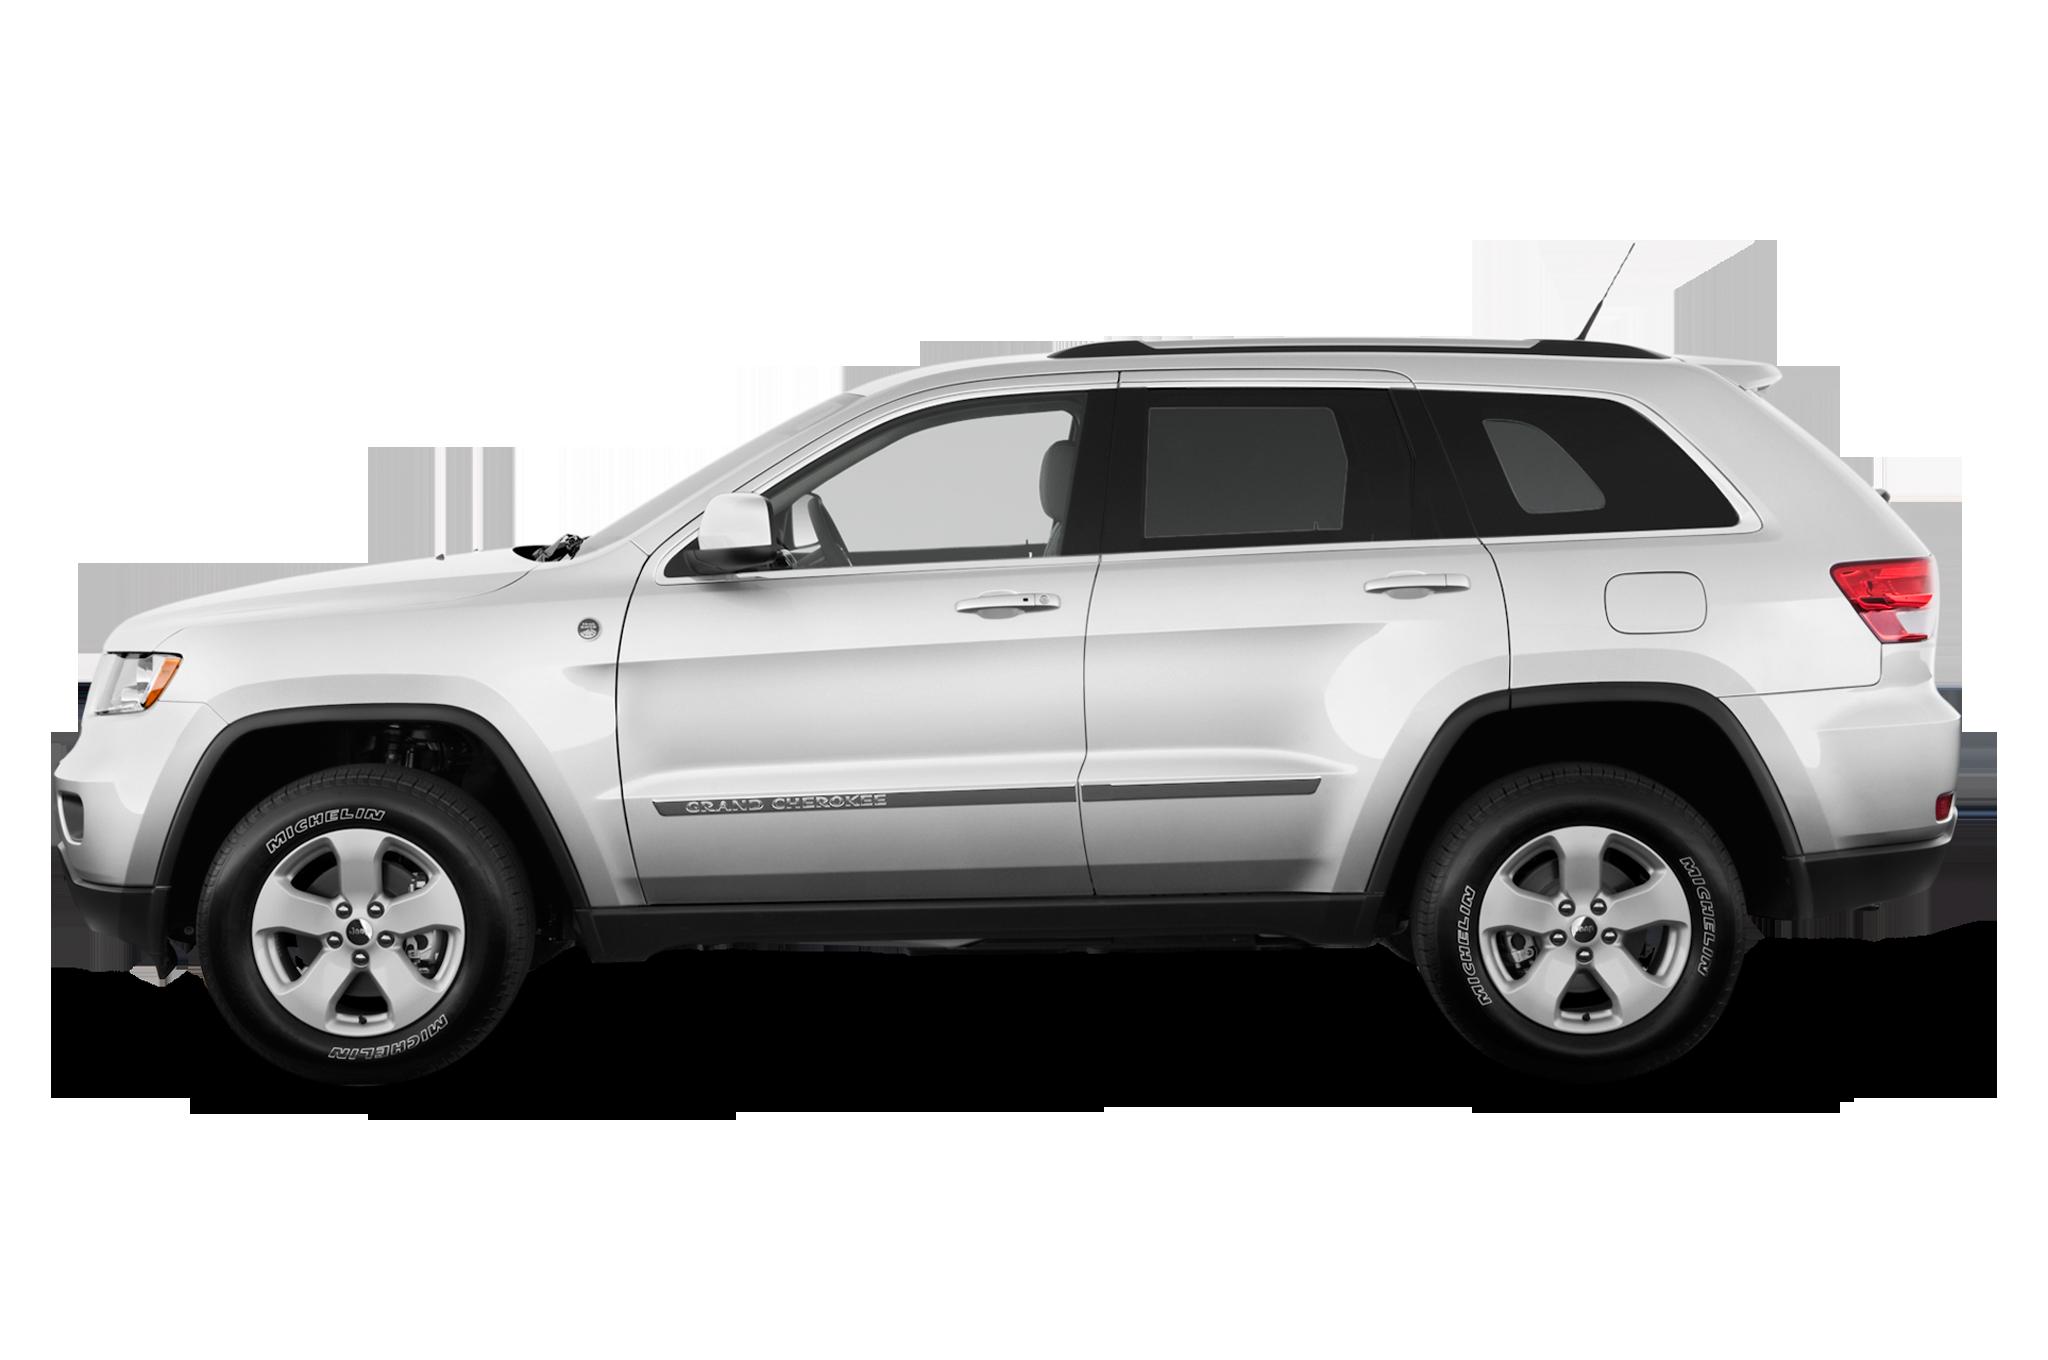 Report Jeep Unveiling 2013 Grand Cherokee Diesel at Detroit